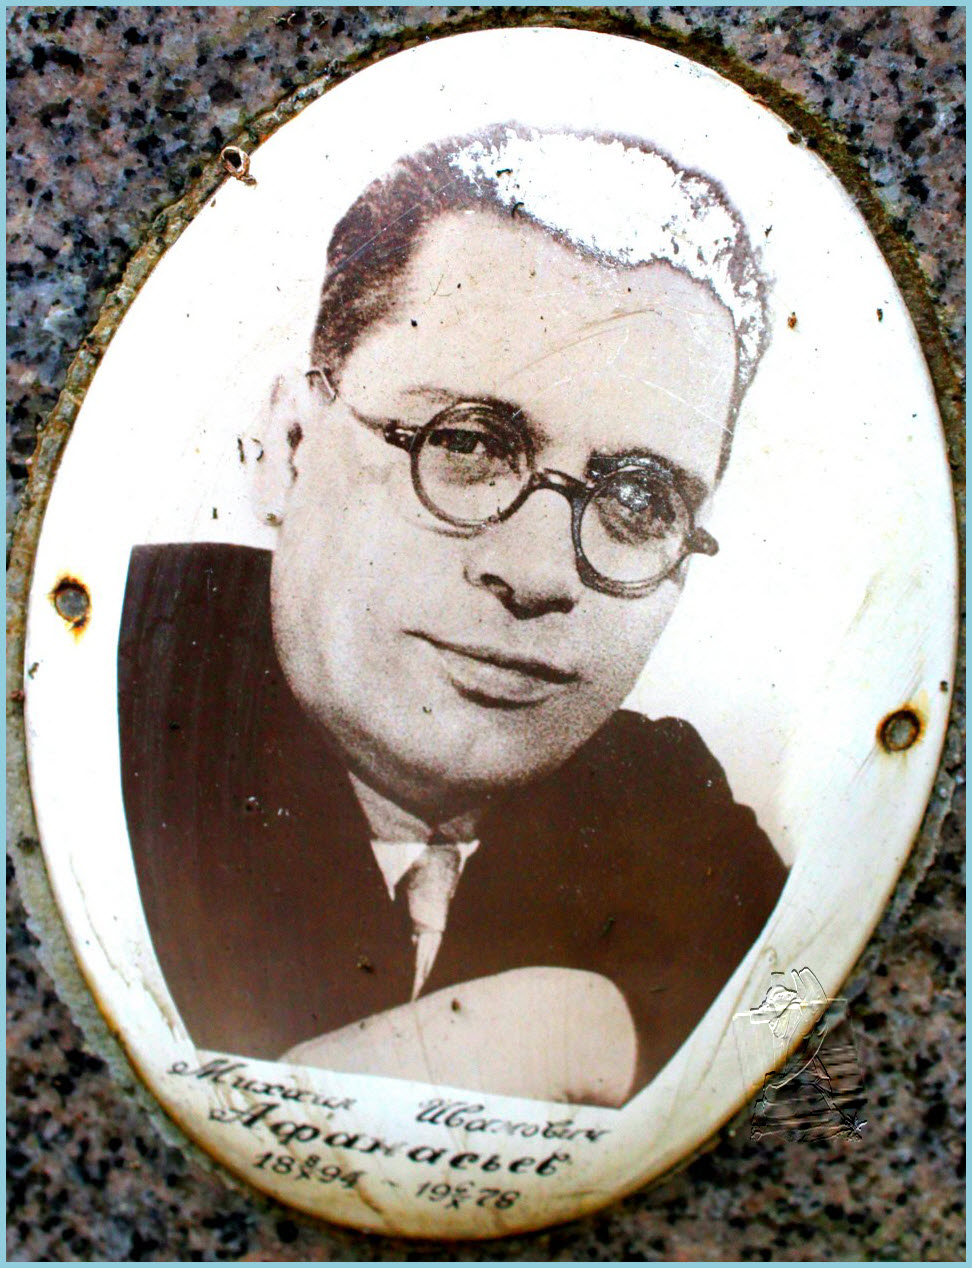 Могила Афанасьева М.И. на Северном кладбище